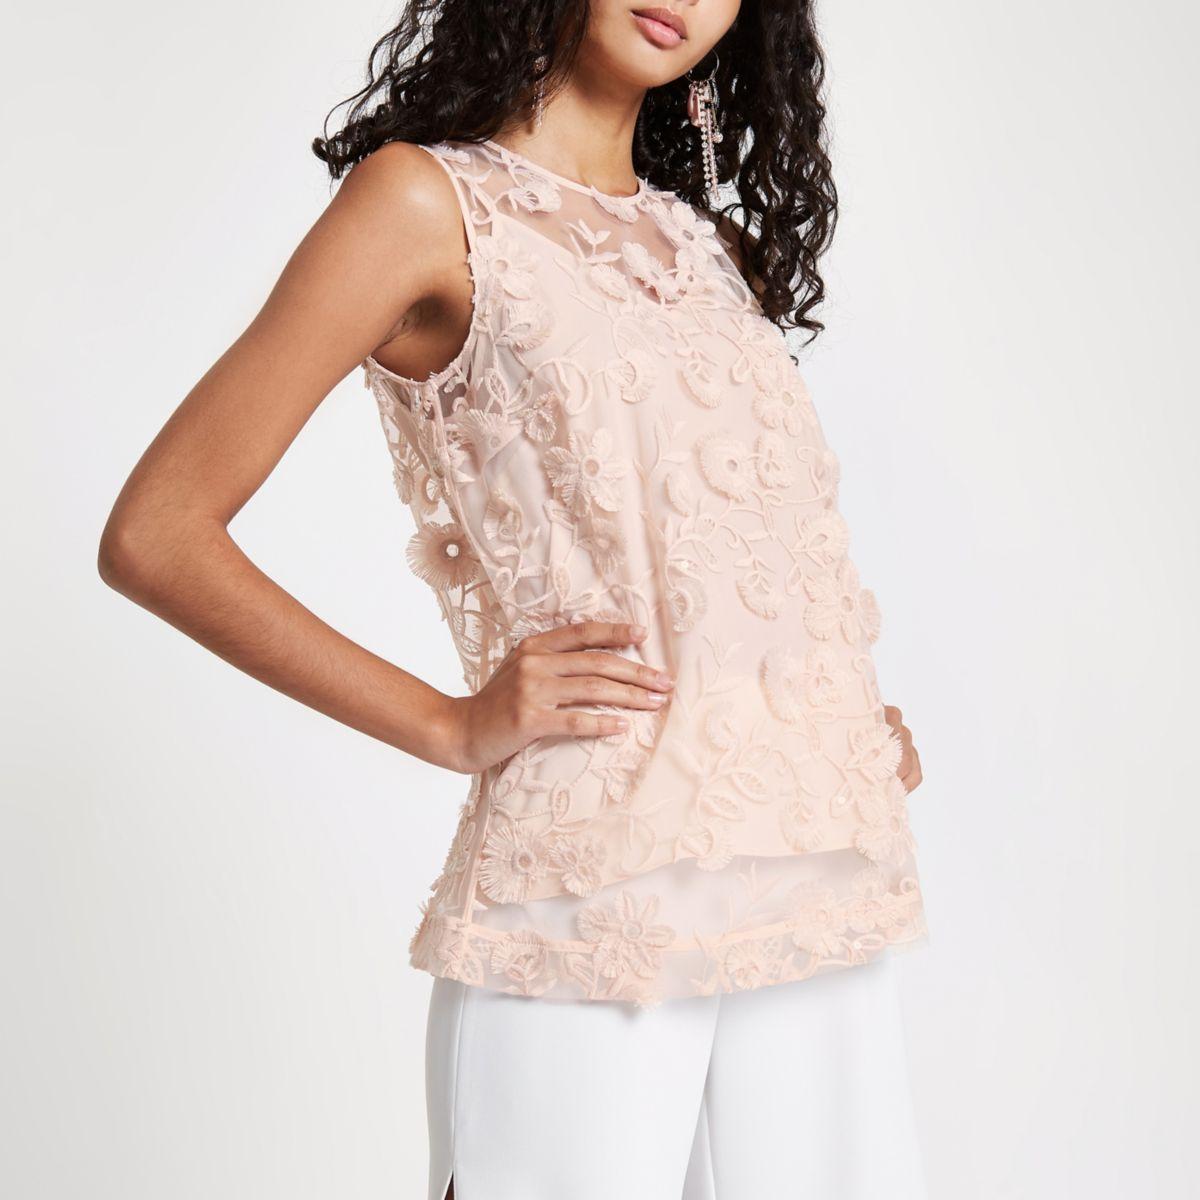 floral Pink floral Pink top Pink cami embroidered cami embroidered embroidered floral cami top qYgS8